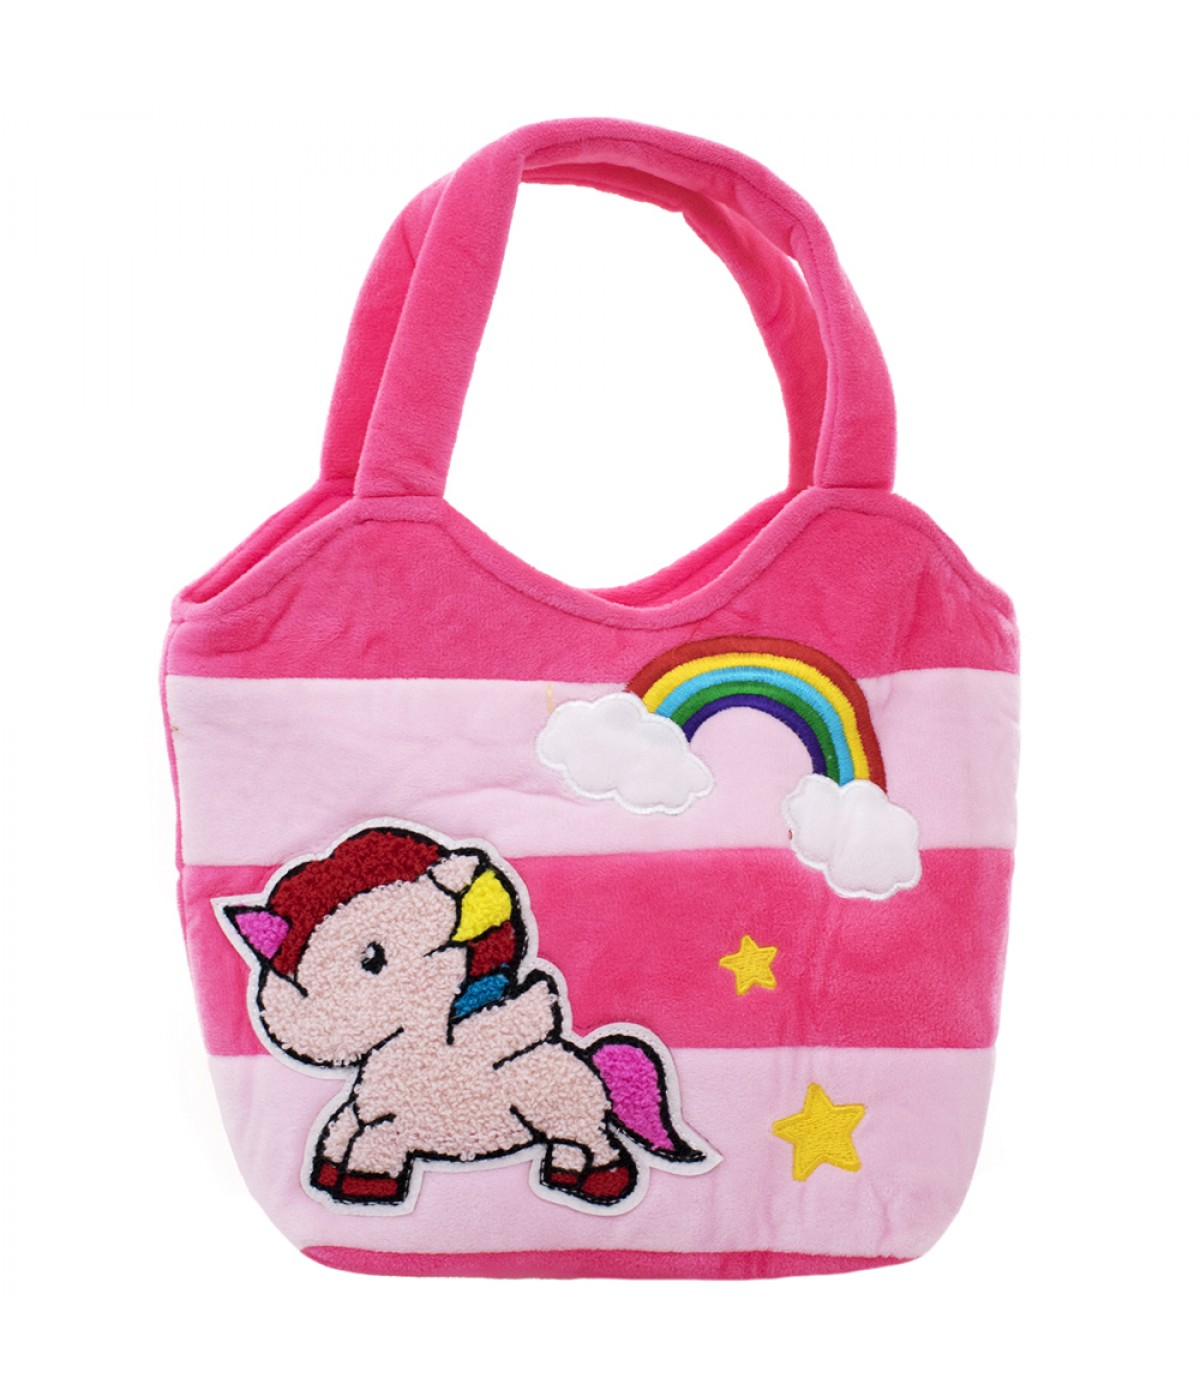 Bolsa Dourada Infantil : Bolsa m?o infantil rosa pel?cia unic?rnio xt m